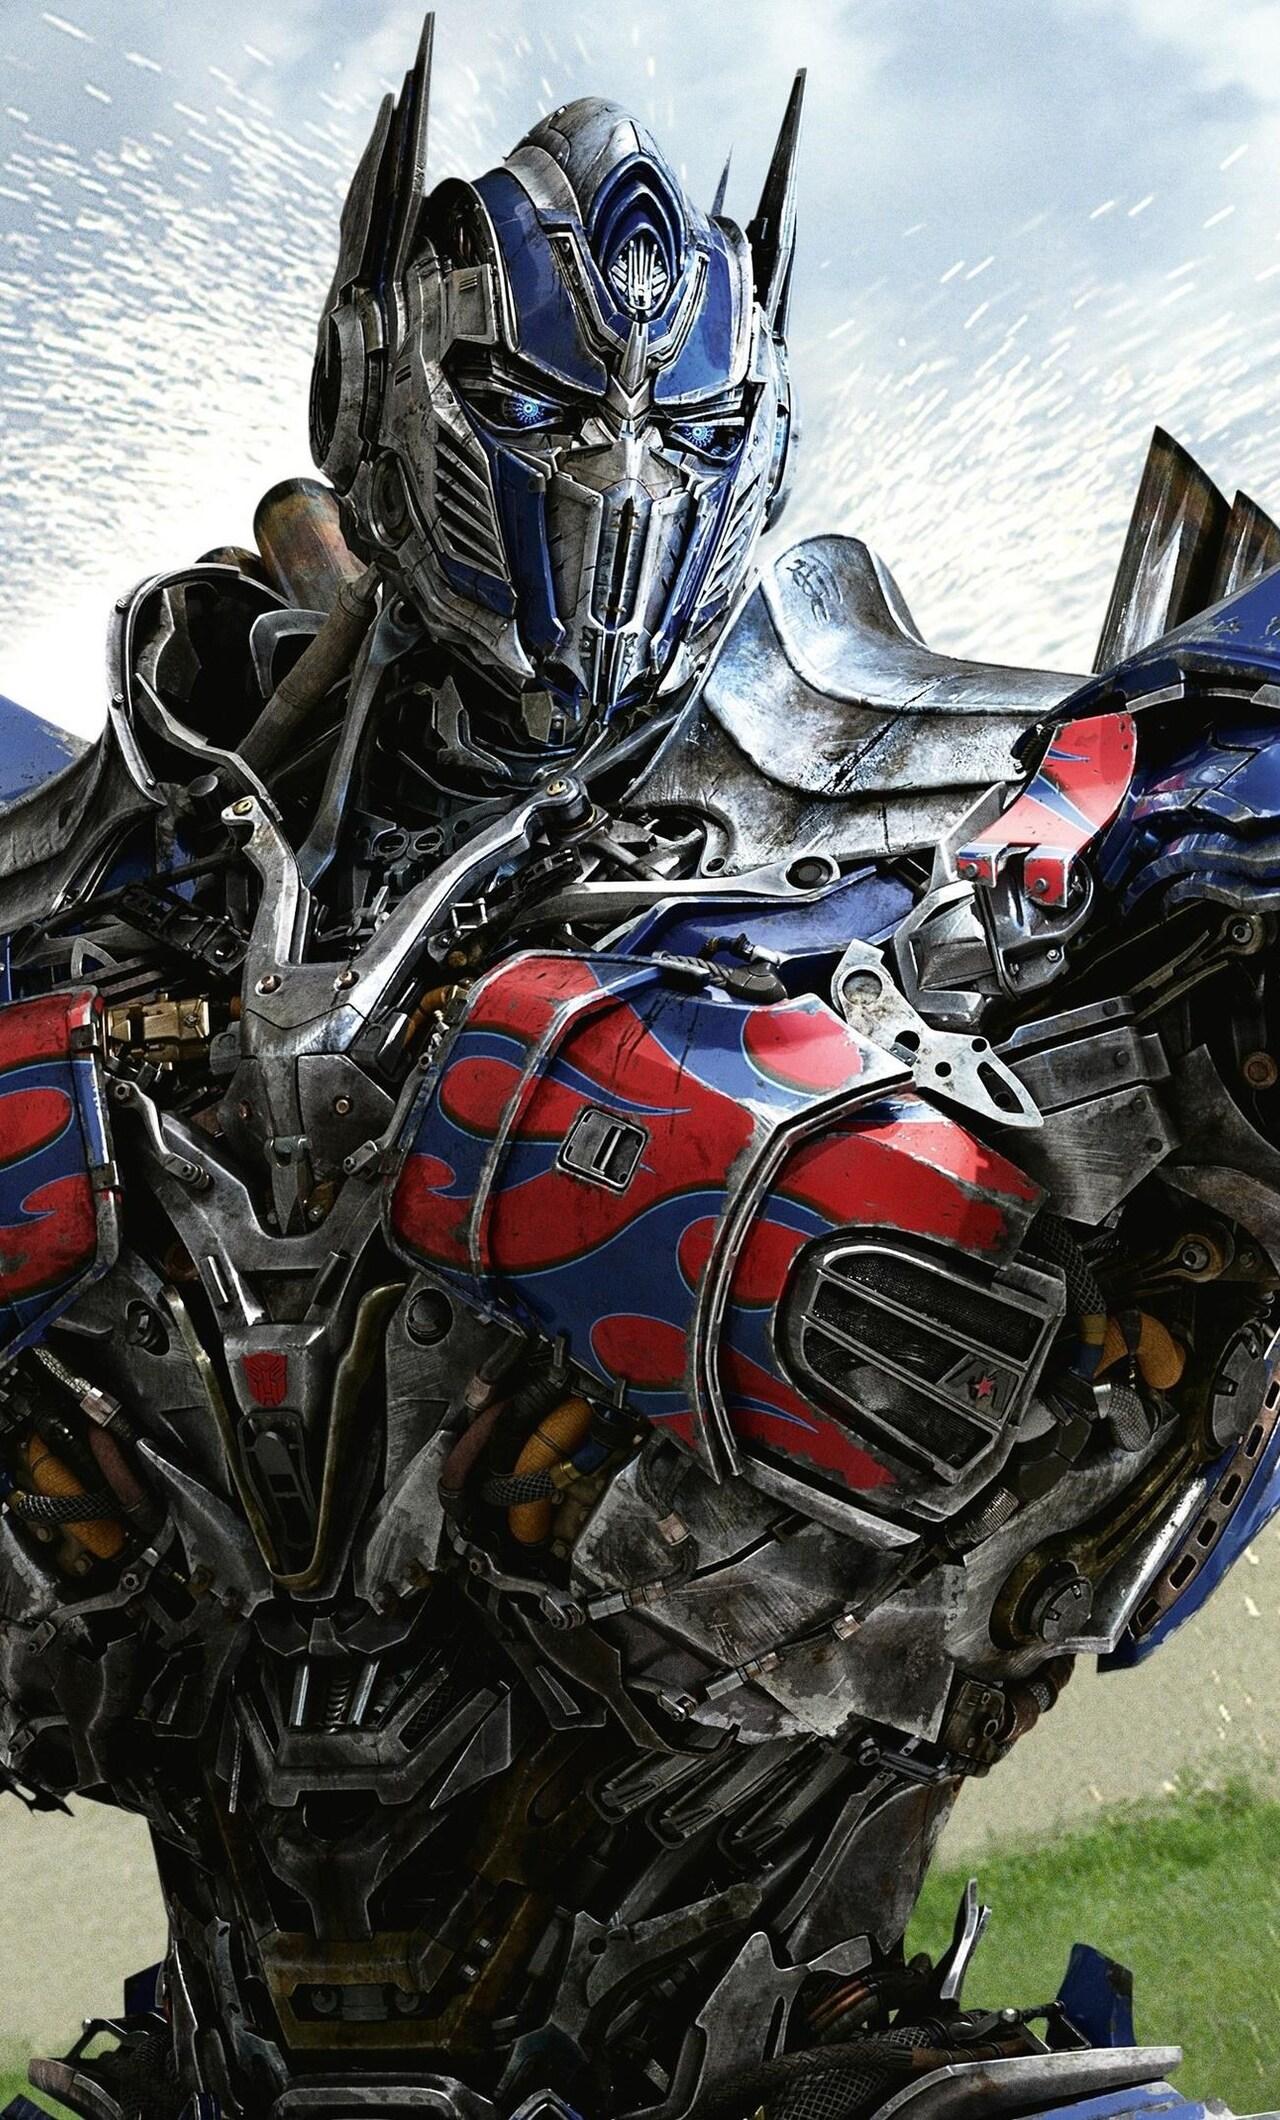 Beast 3d Wallpaper 1280x2120 Optimus Prime In Transformers 4 Age Of